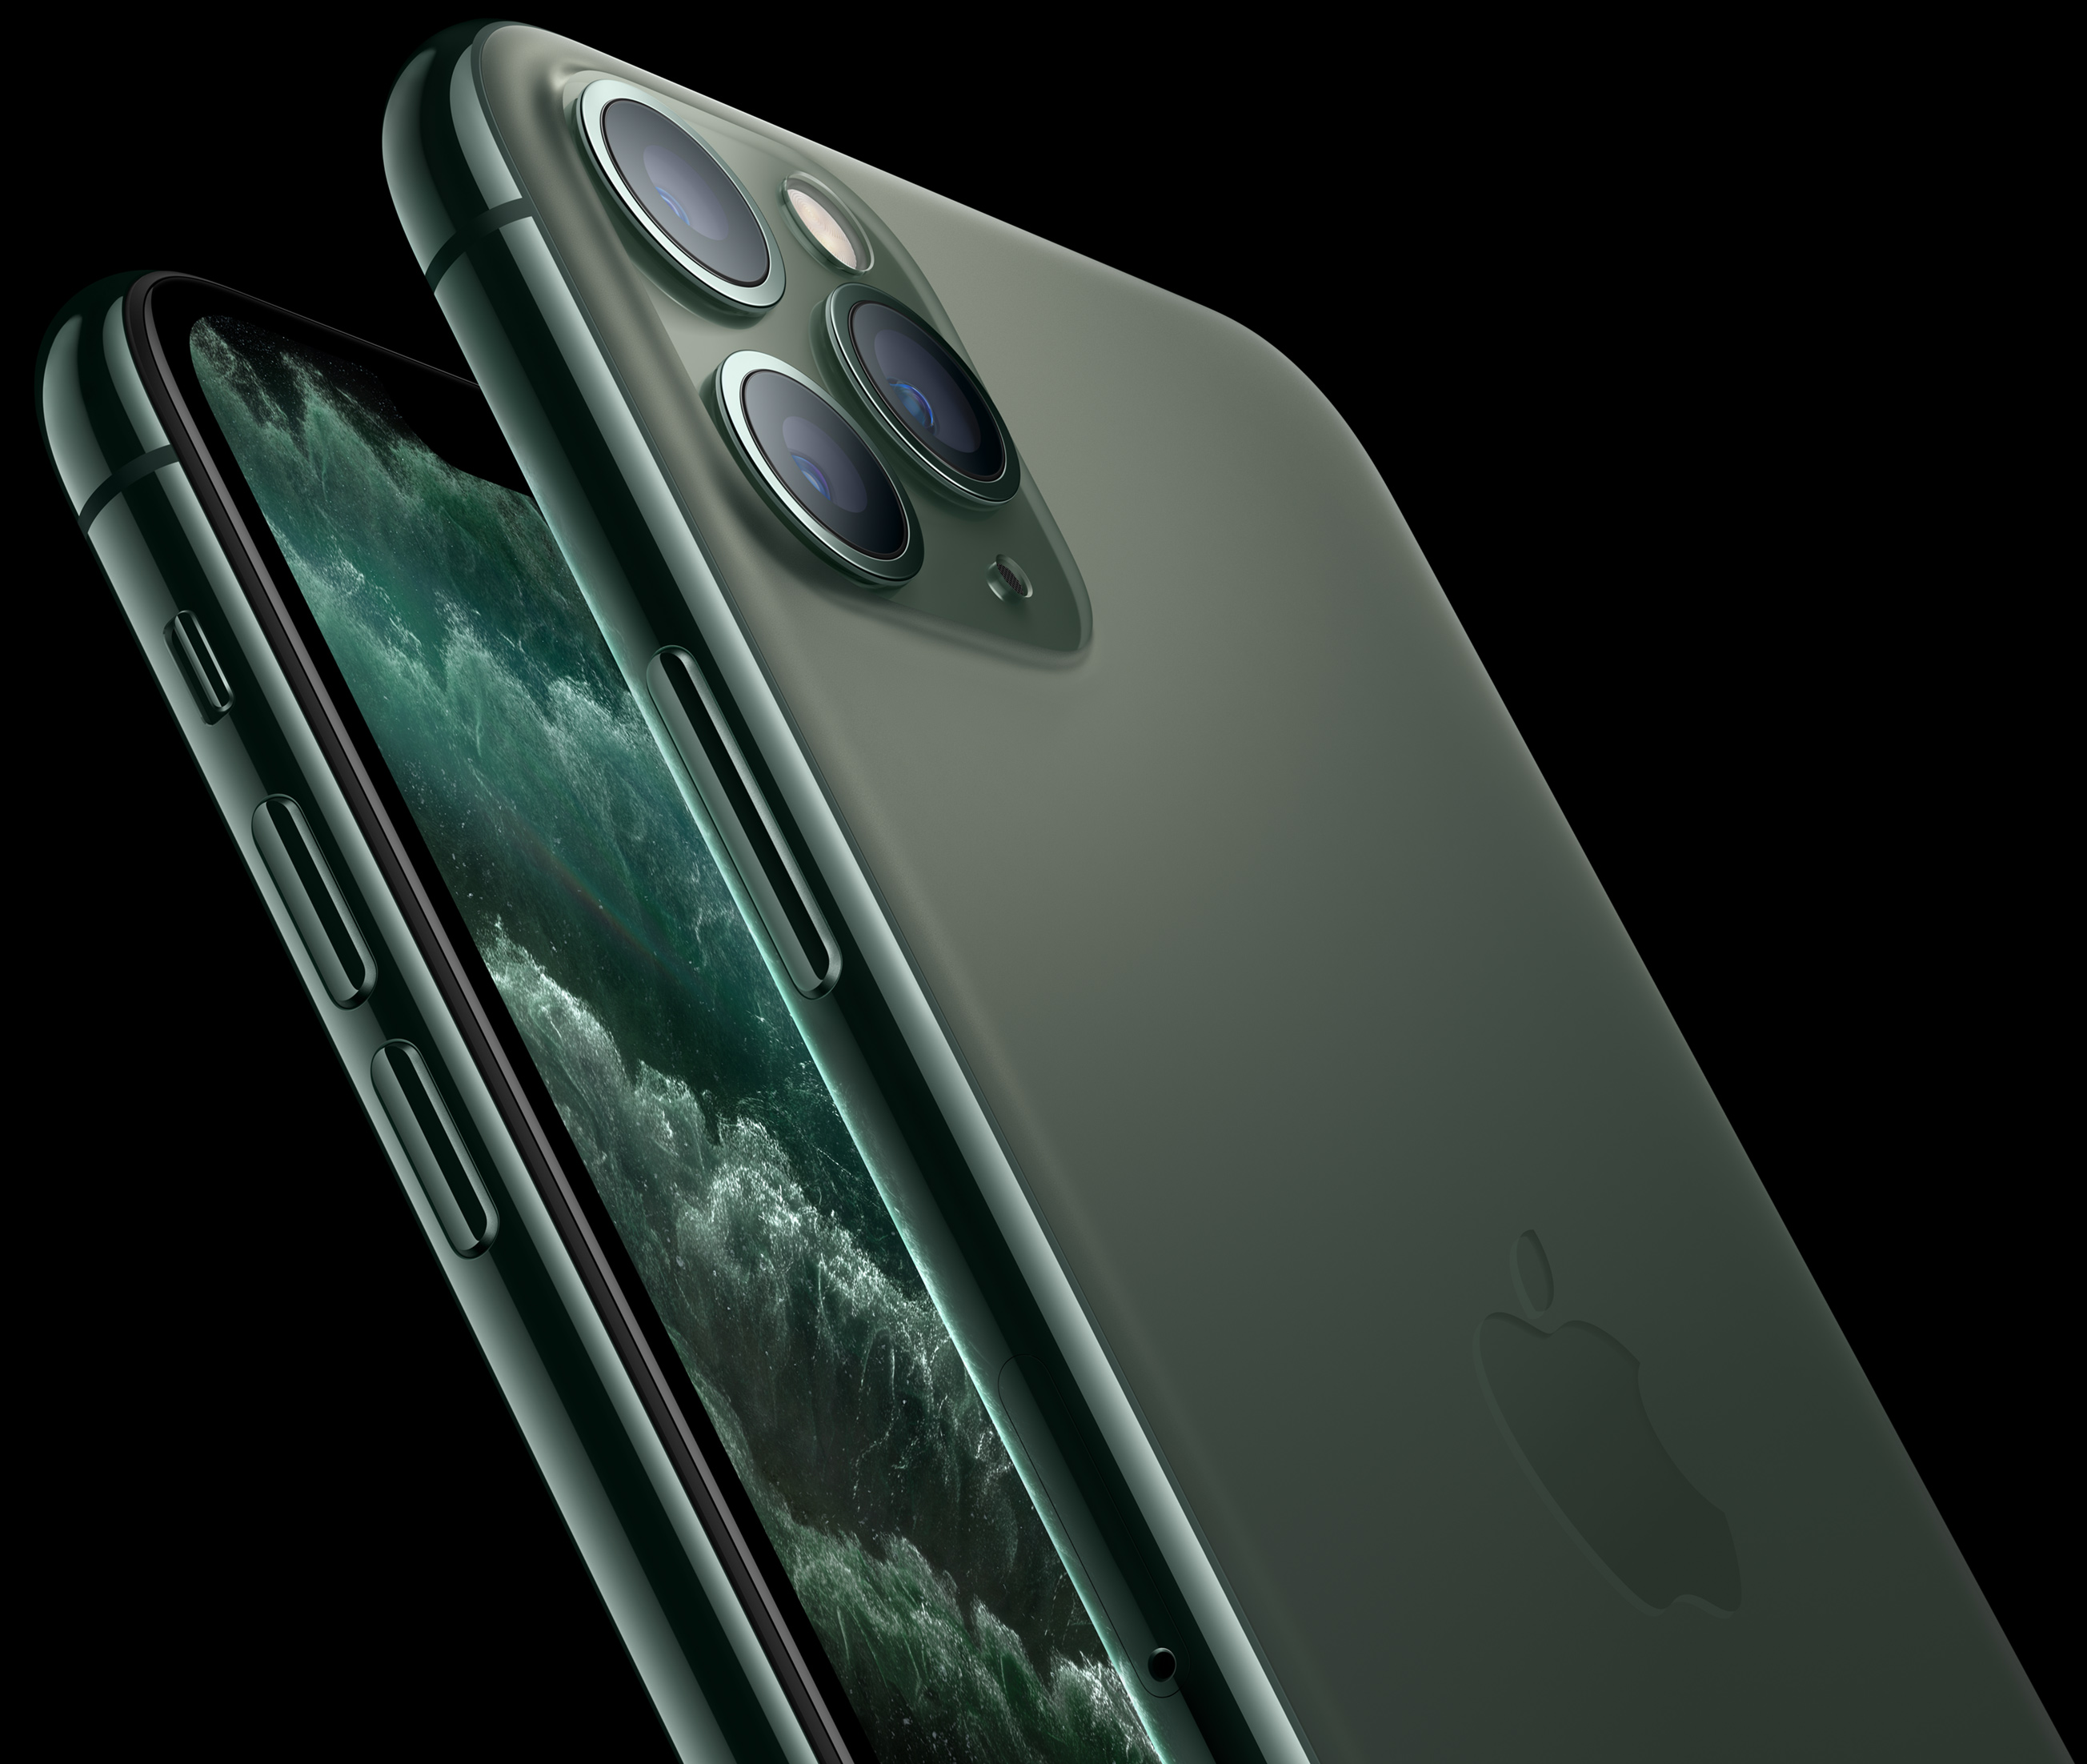 iphone 11 pro max 64 midnight green